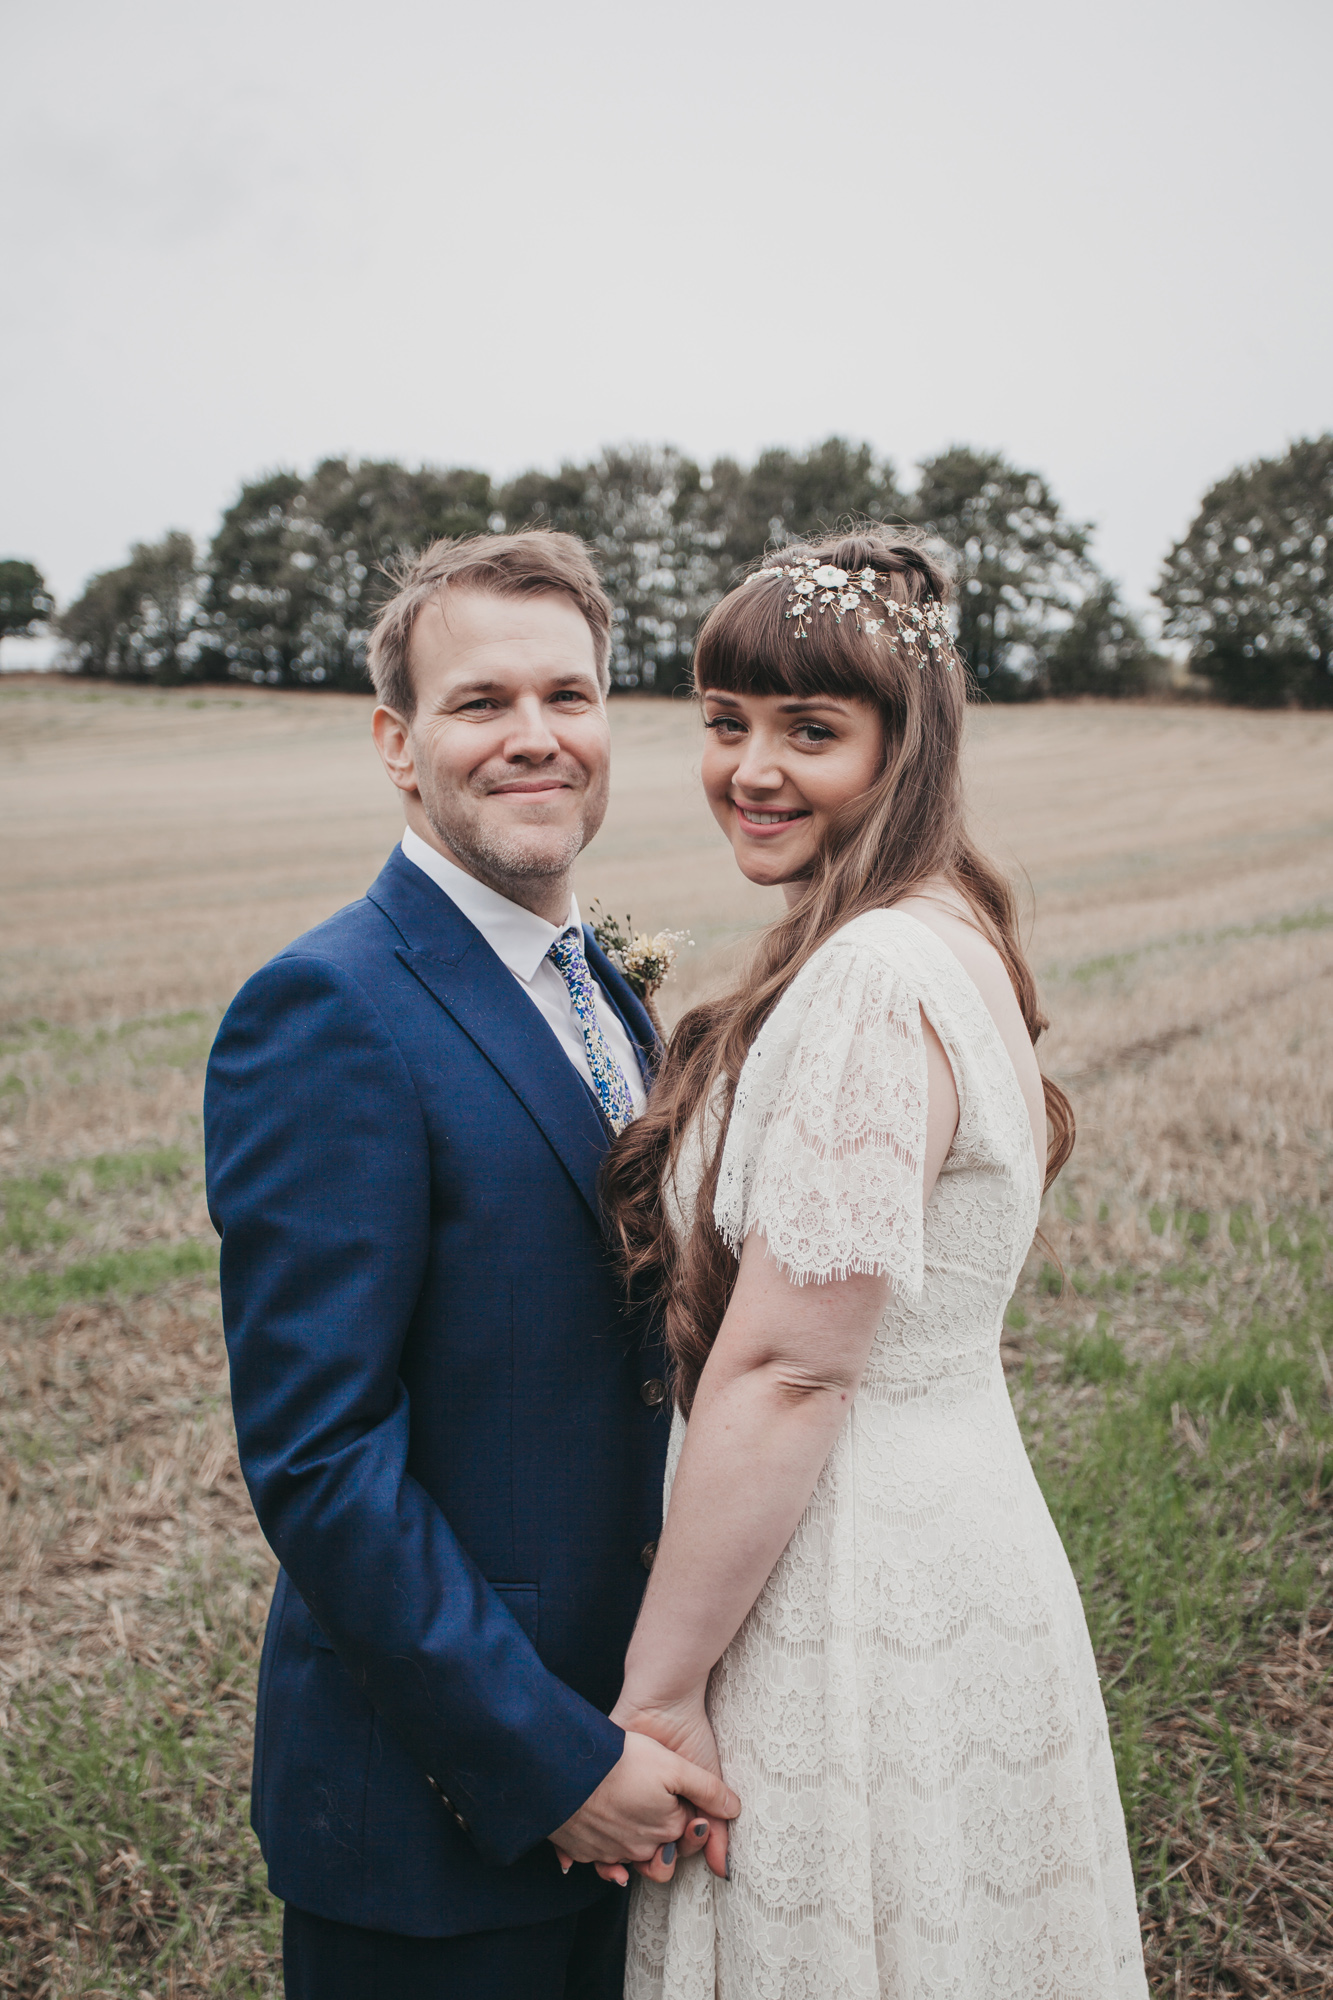 Kristy-Back-Garden-Outdoor-Wedding-Sheffield-Industrial-Warehouse-Wedding-Bohemian-Kate-Beaumont-Dahlia-Dress-29.jpg